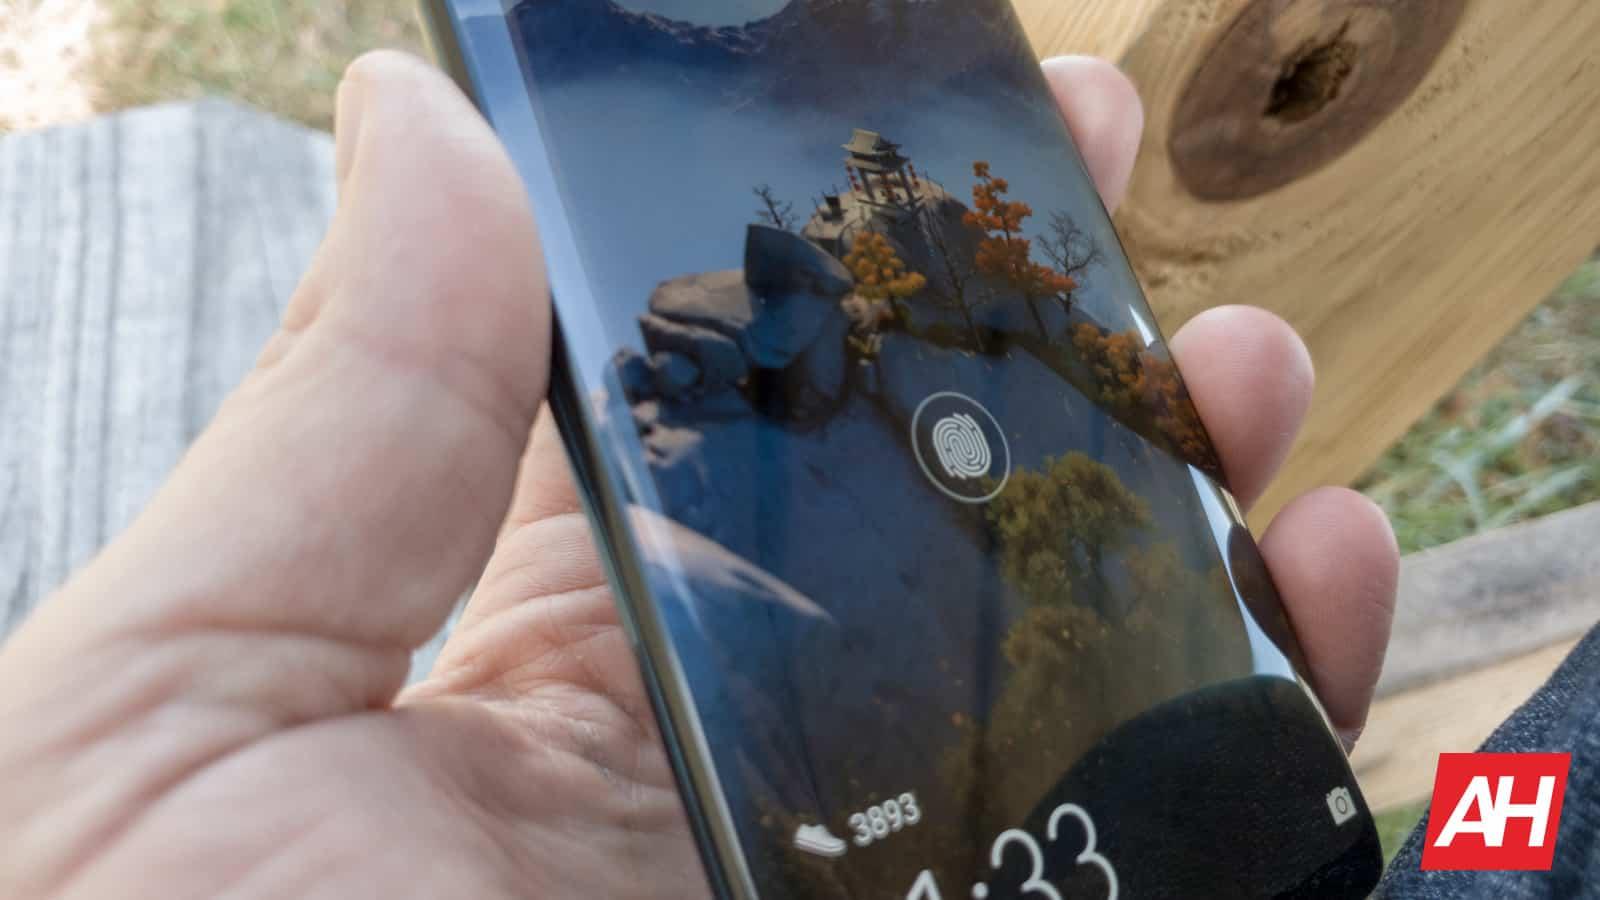 Huawei Mate 20 Pro AH NS 22 in glass fingerprint scanner